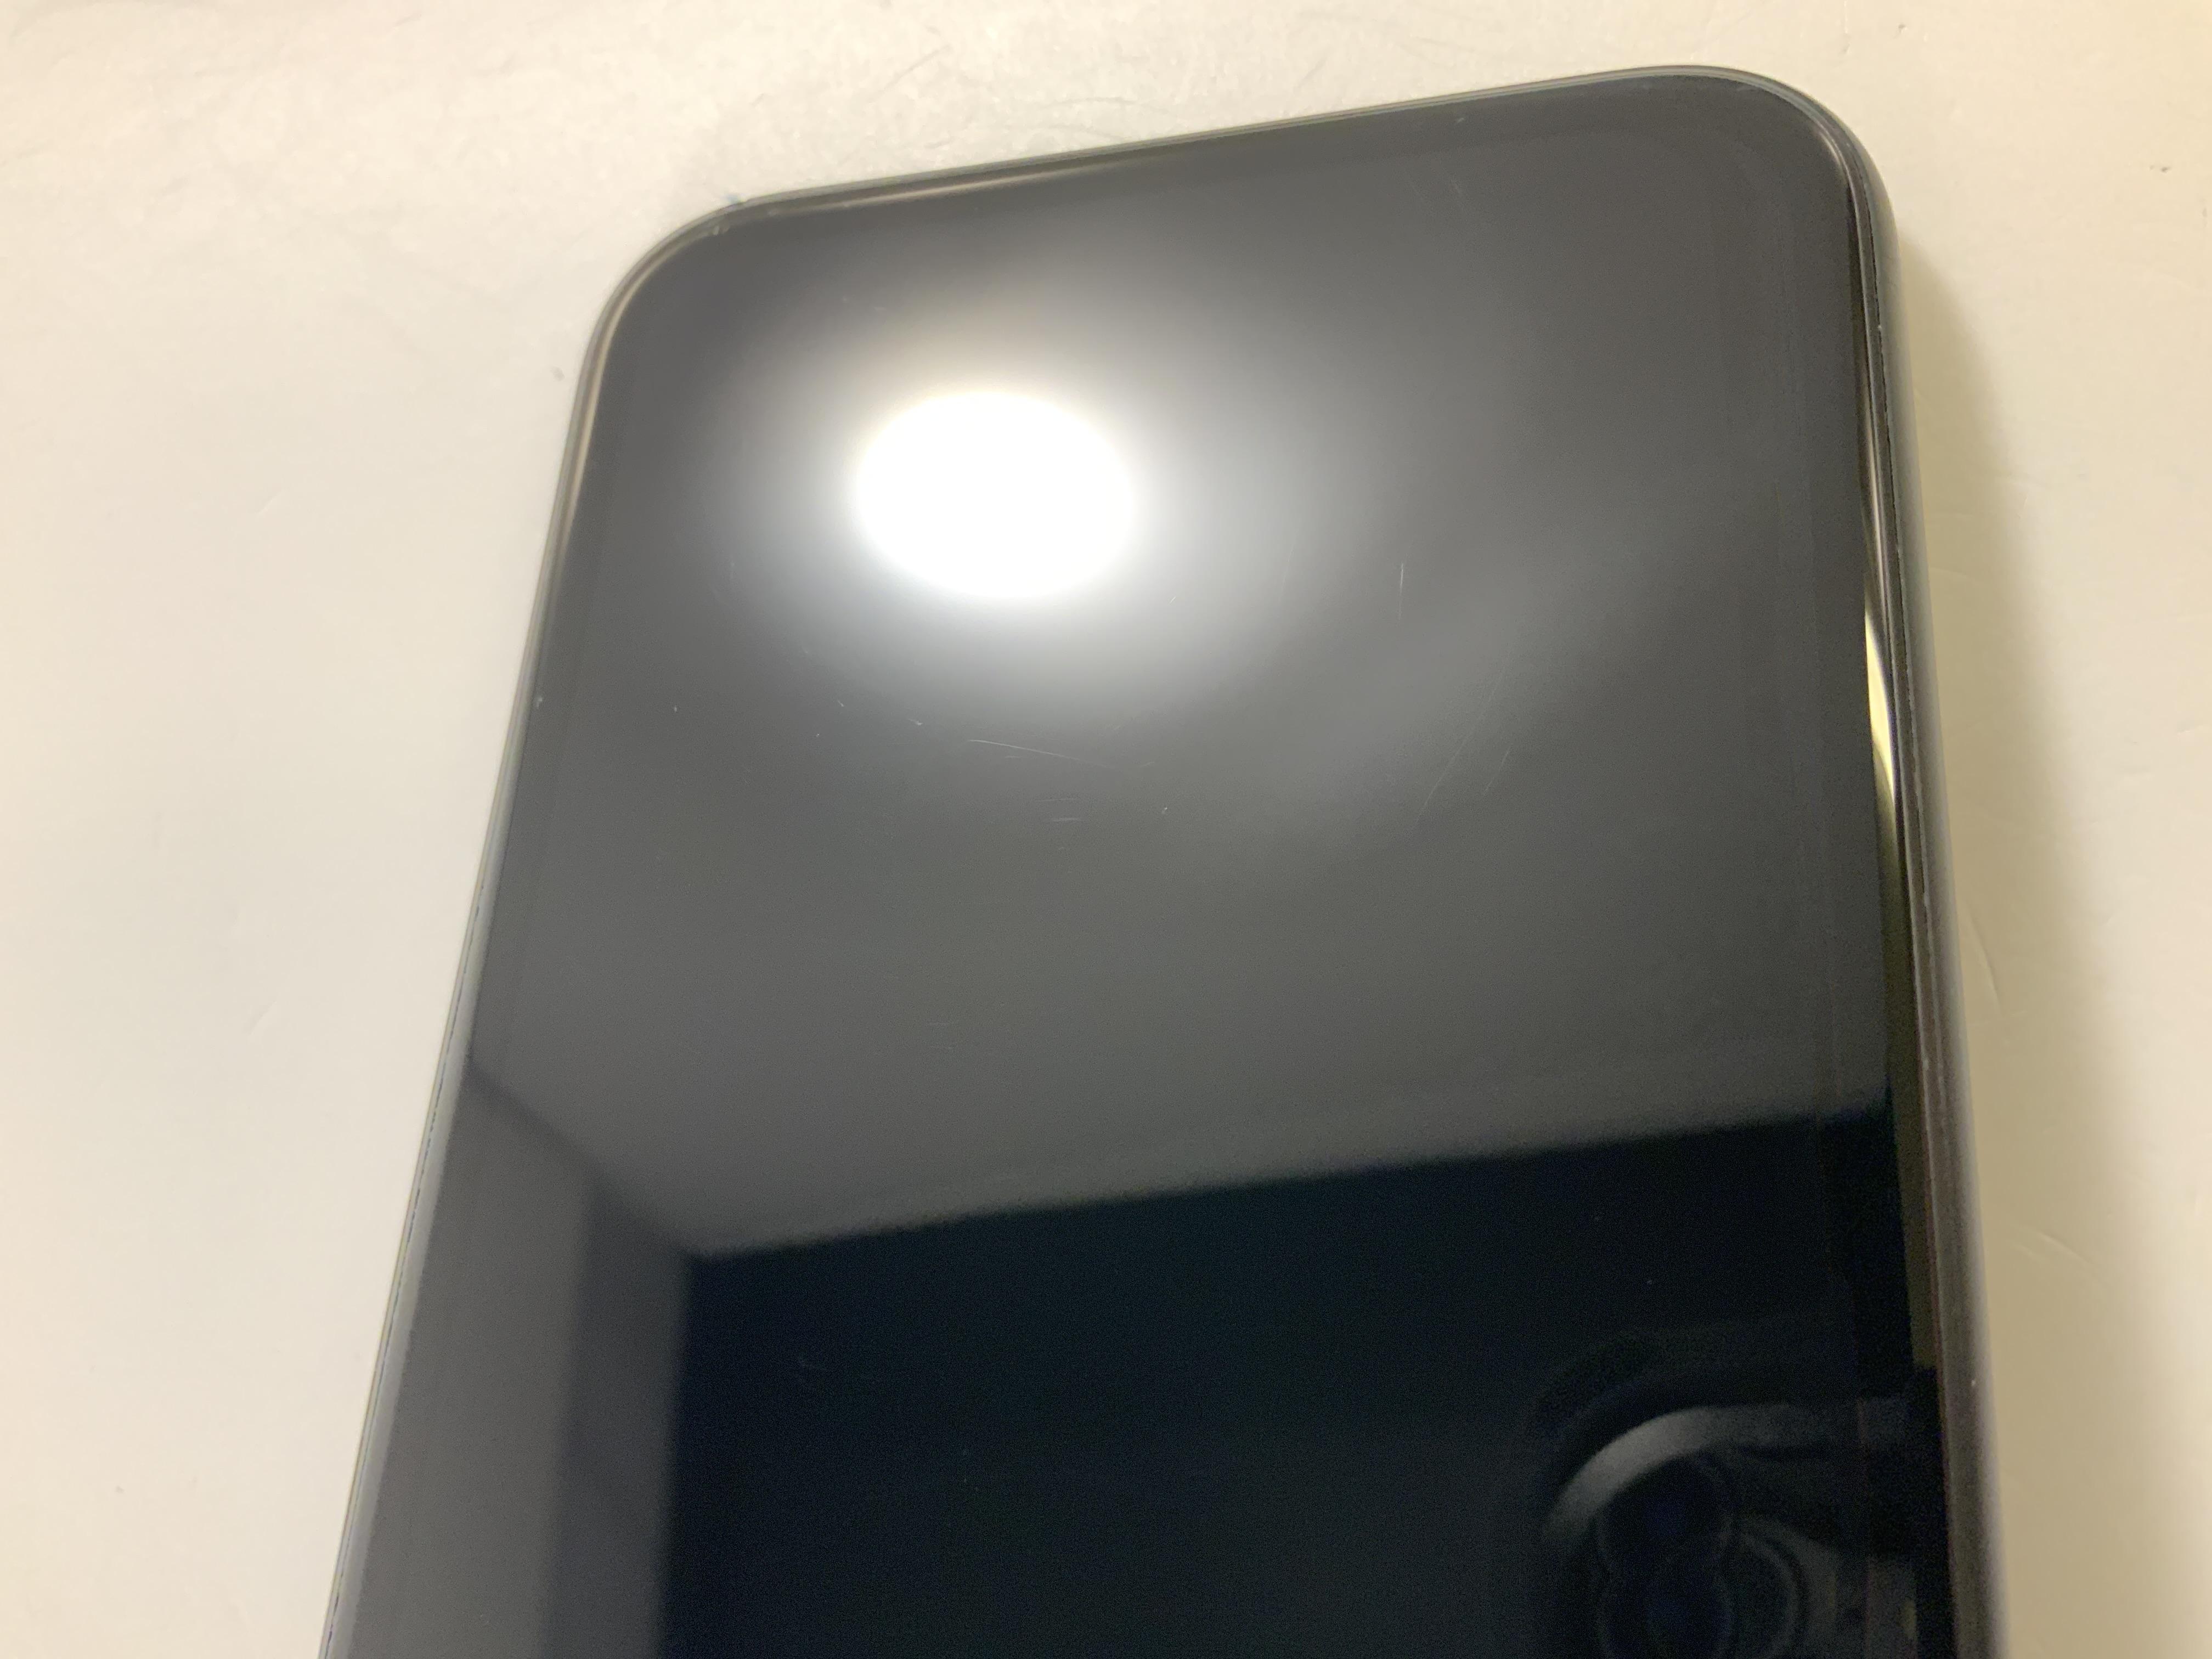 iPhone XR 128GB, 128GB, Black, Afbeelding 3